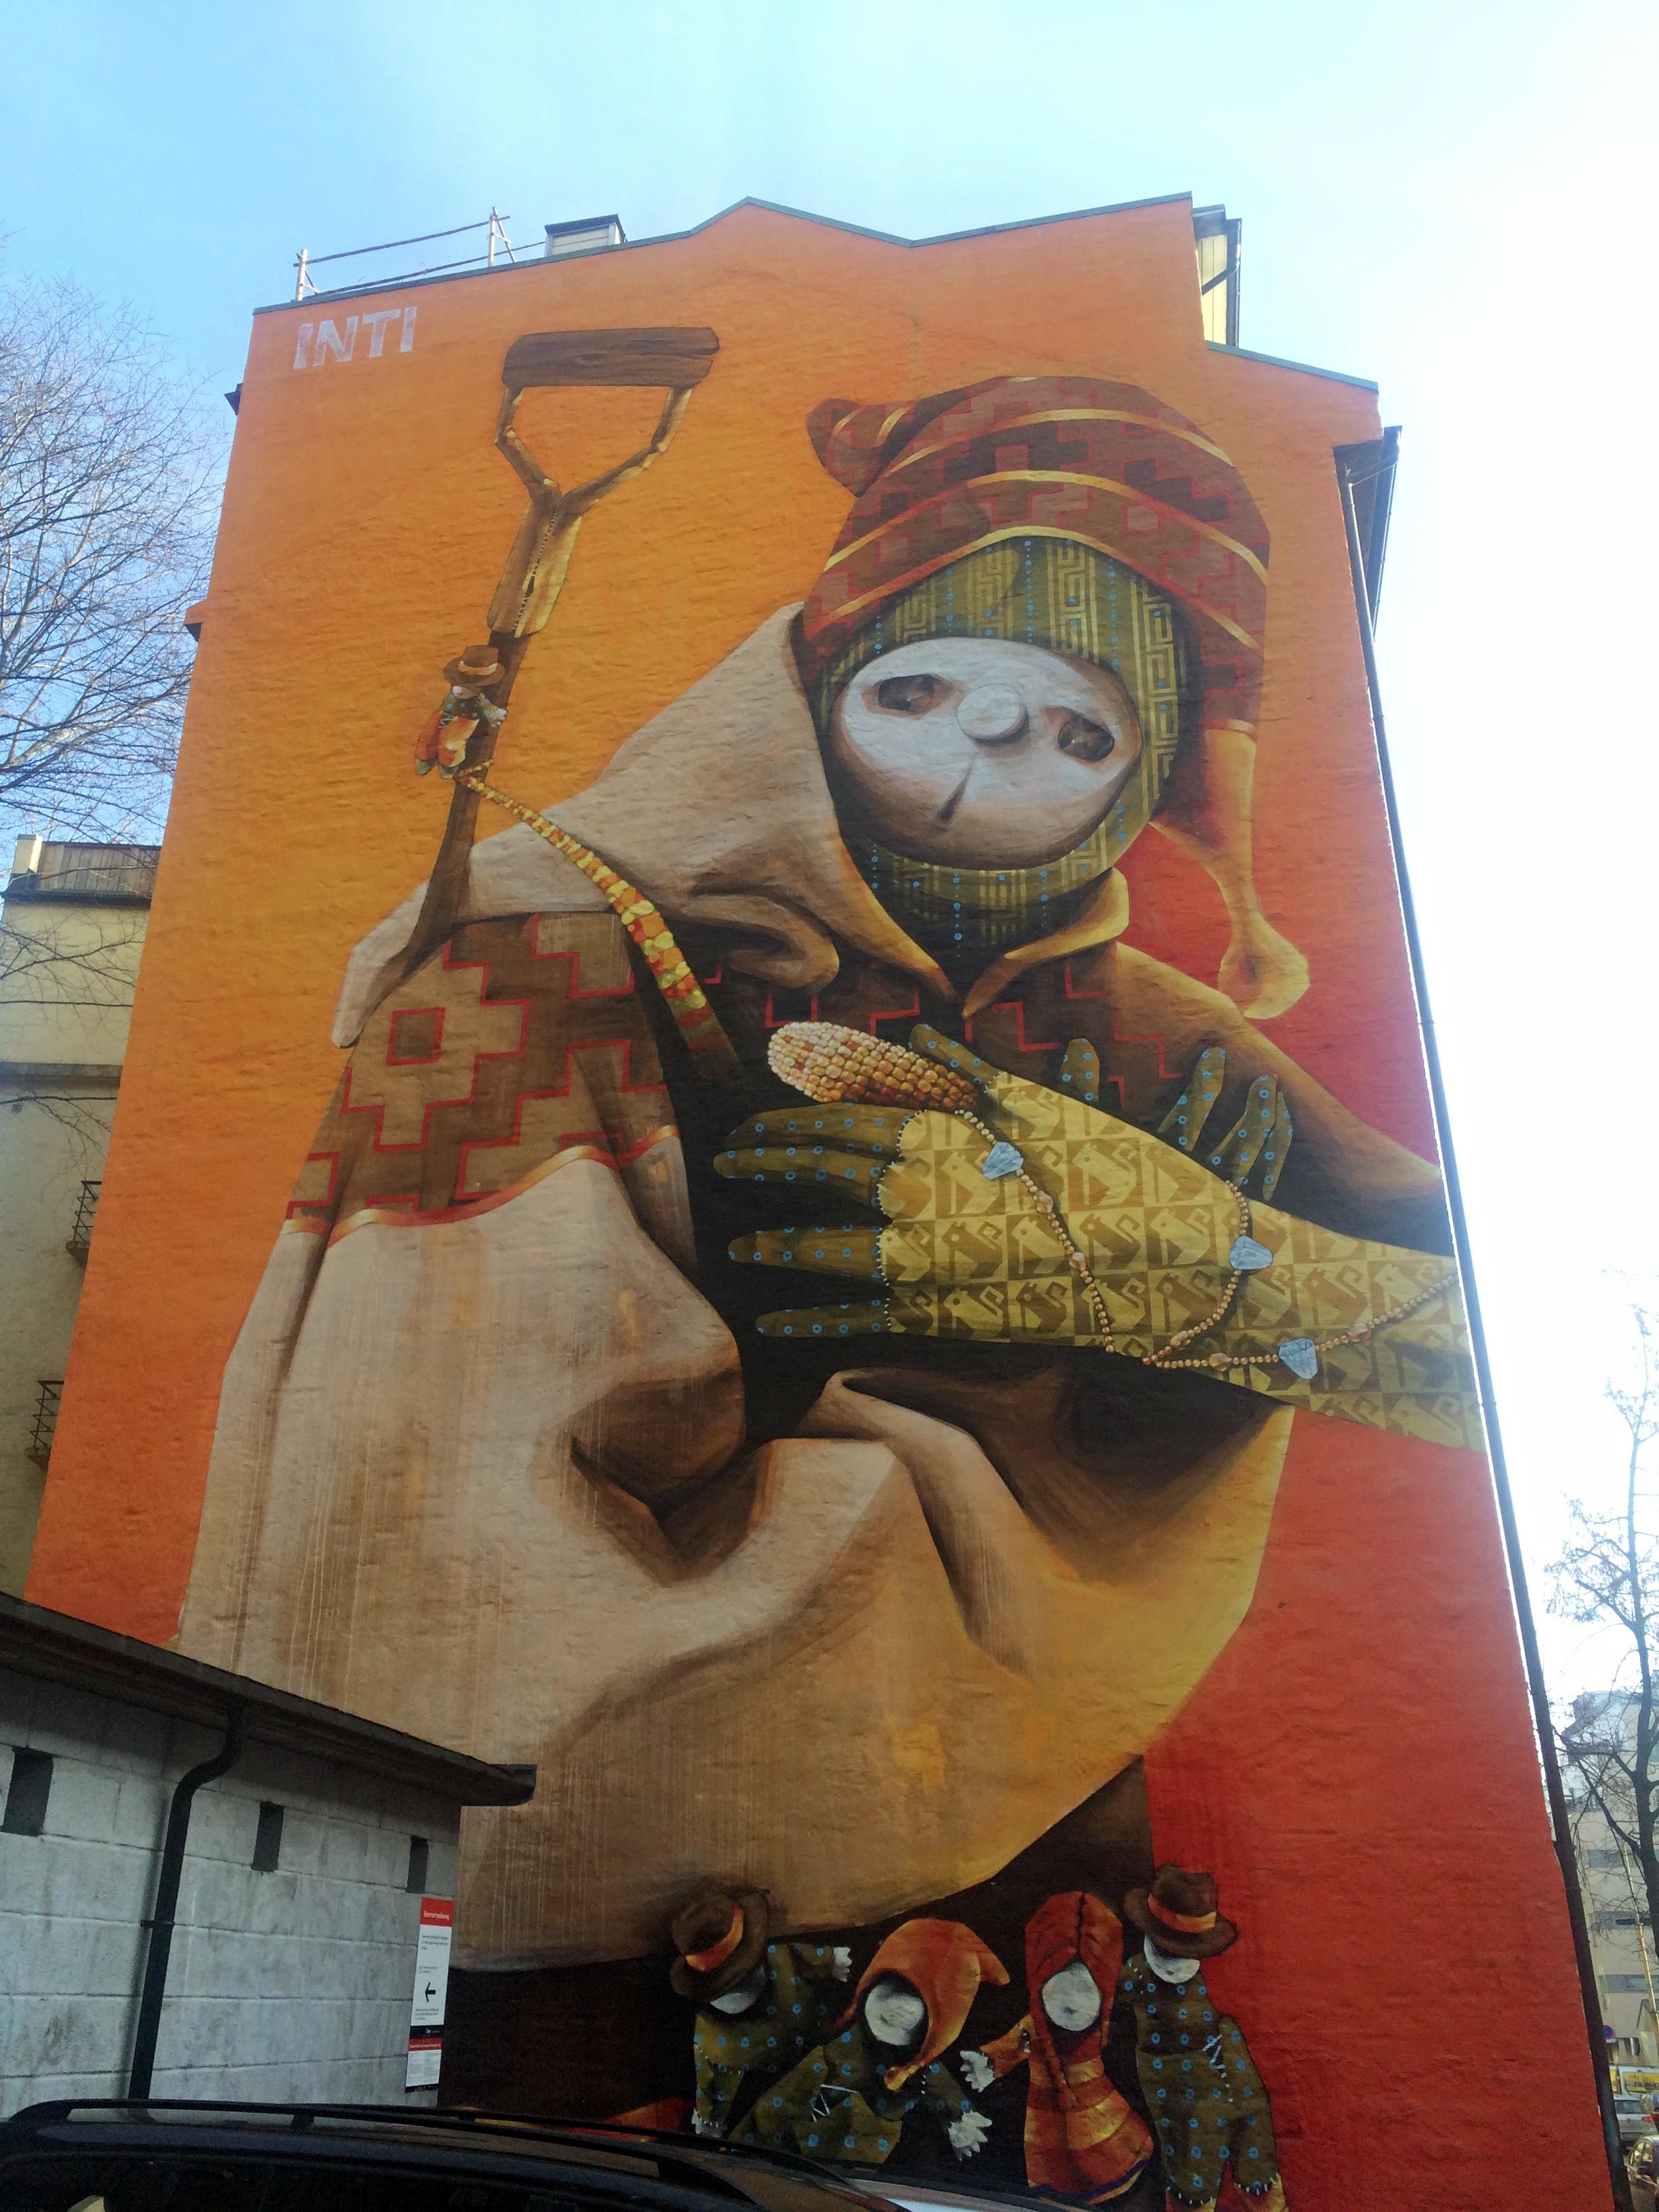 Inti - Street Art - Oslo